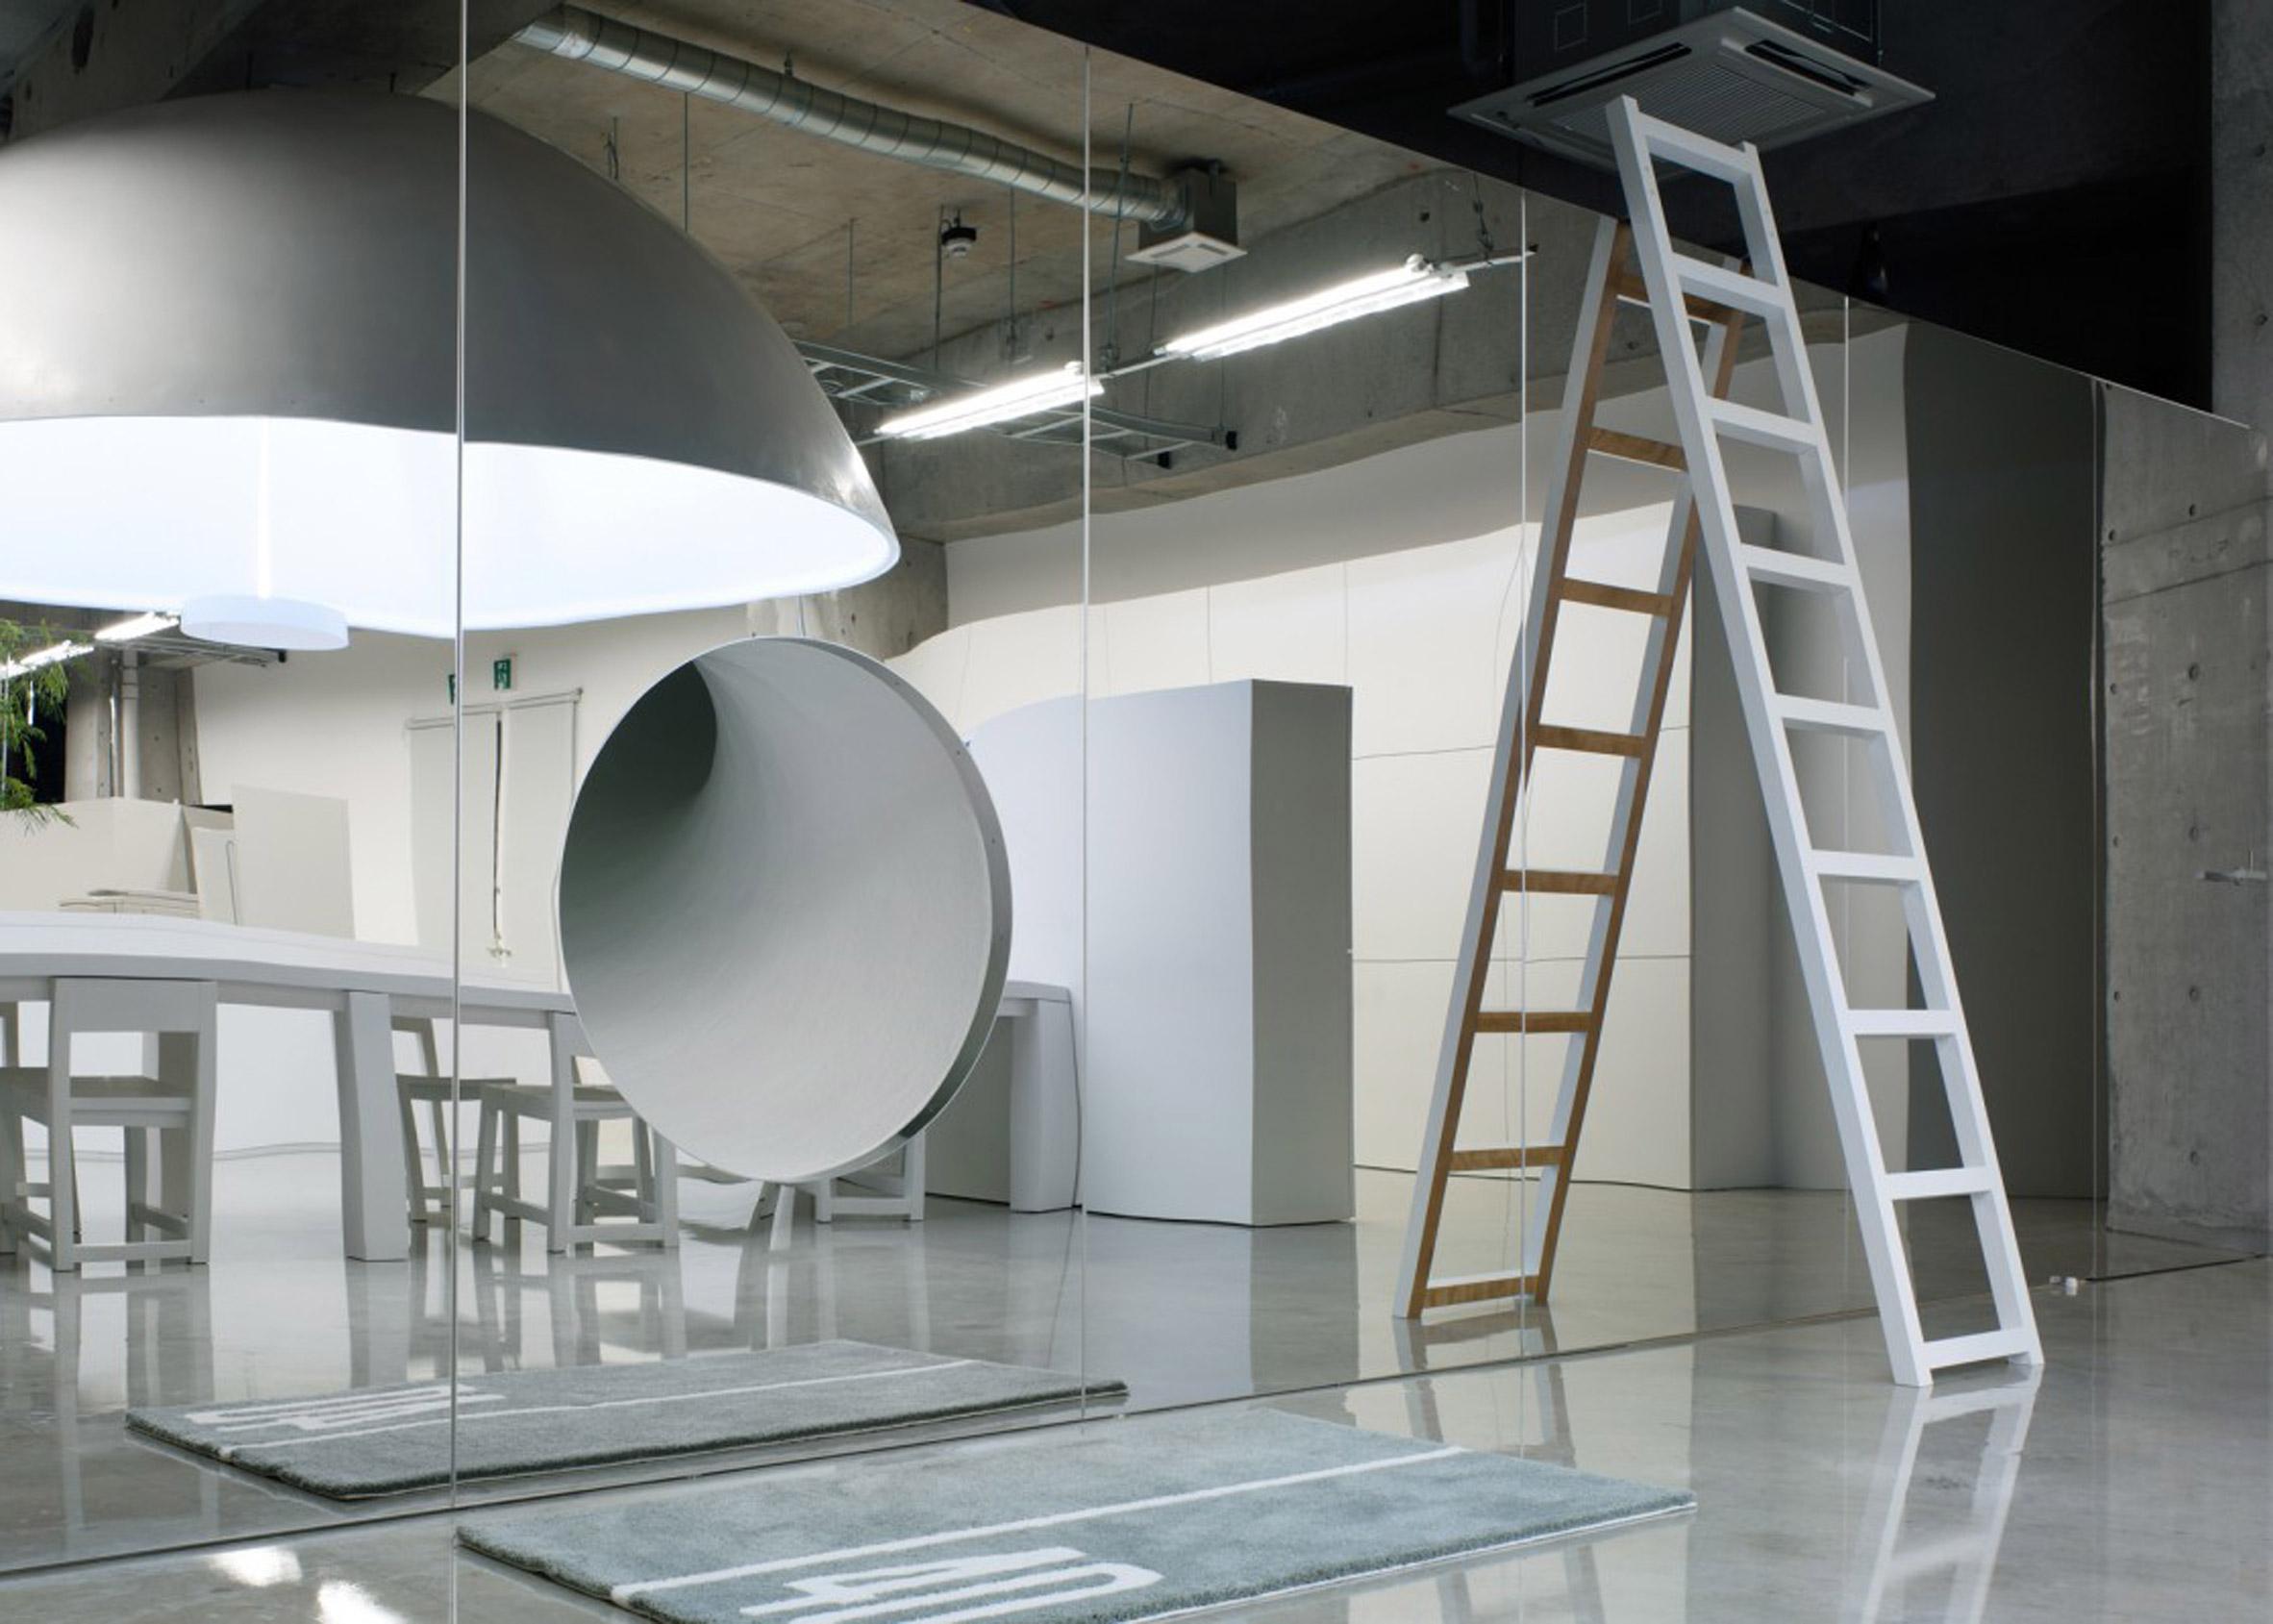 MR Design Office, Japan, by Schemata Architecture Office